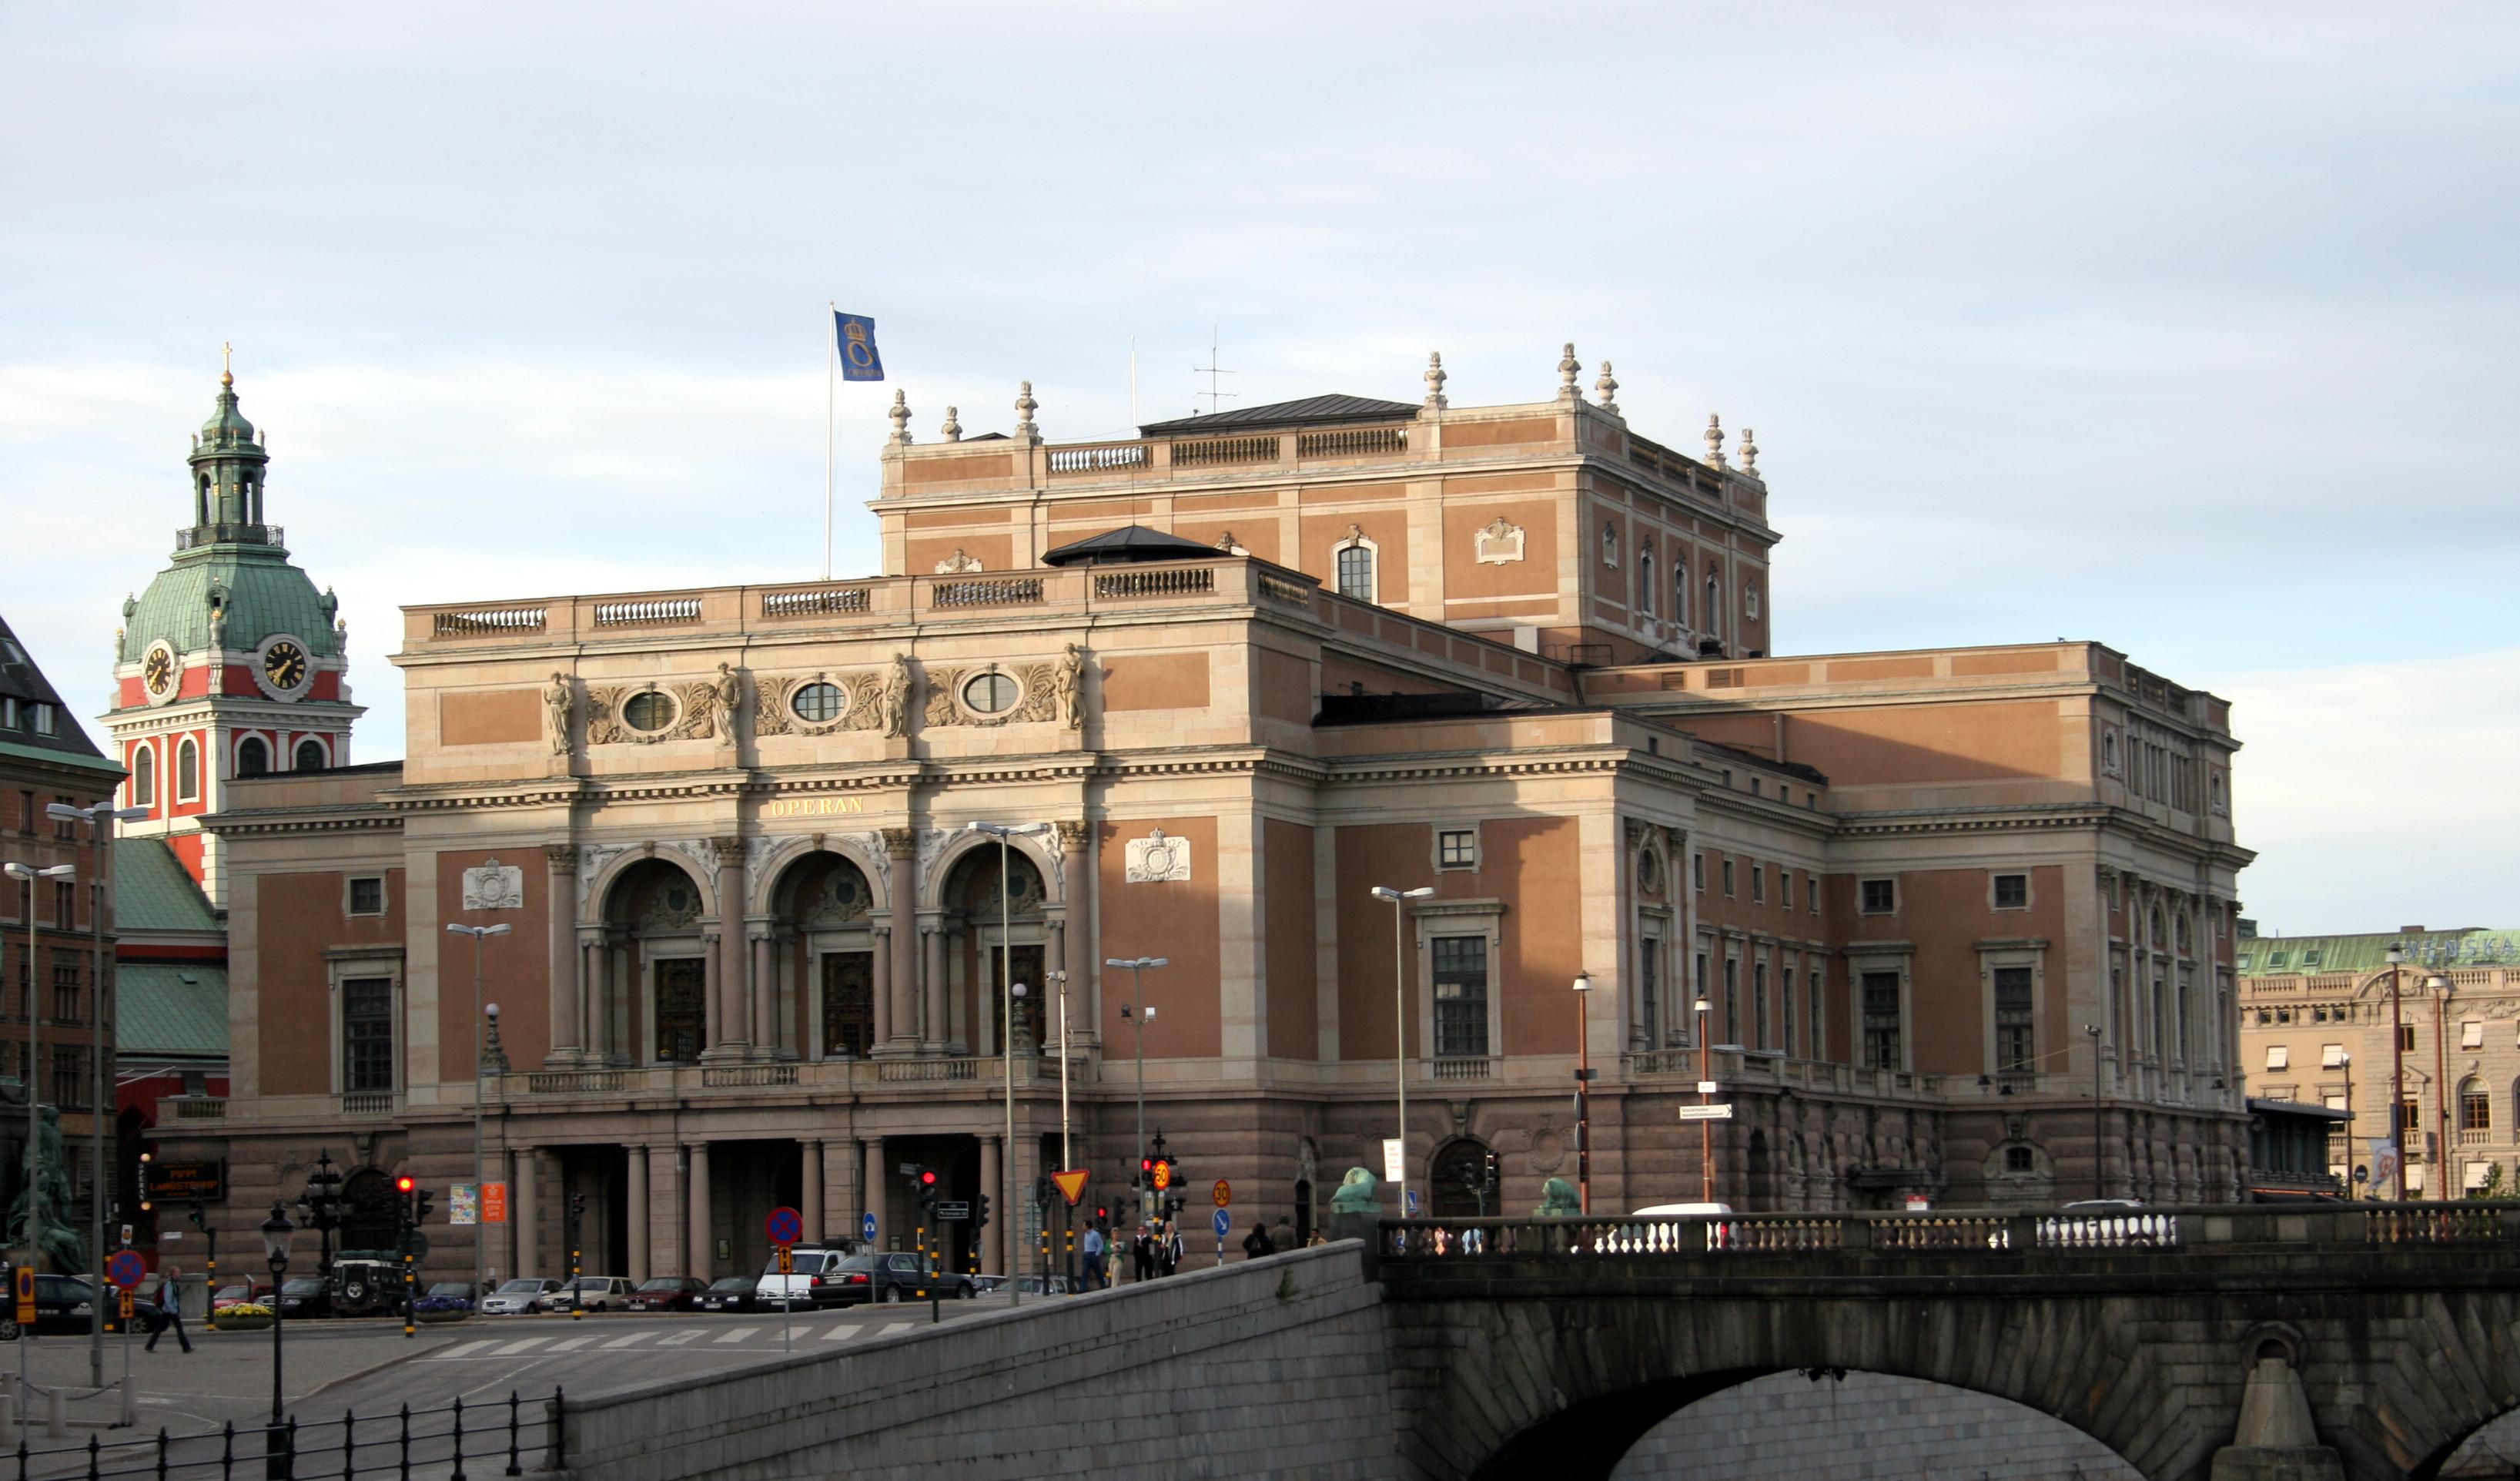 Operan Helsingfors